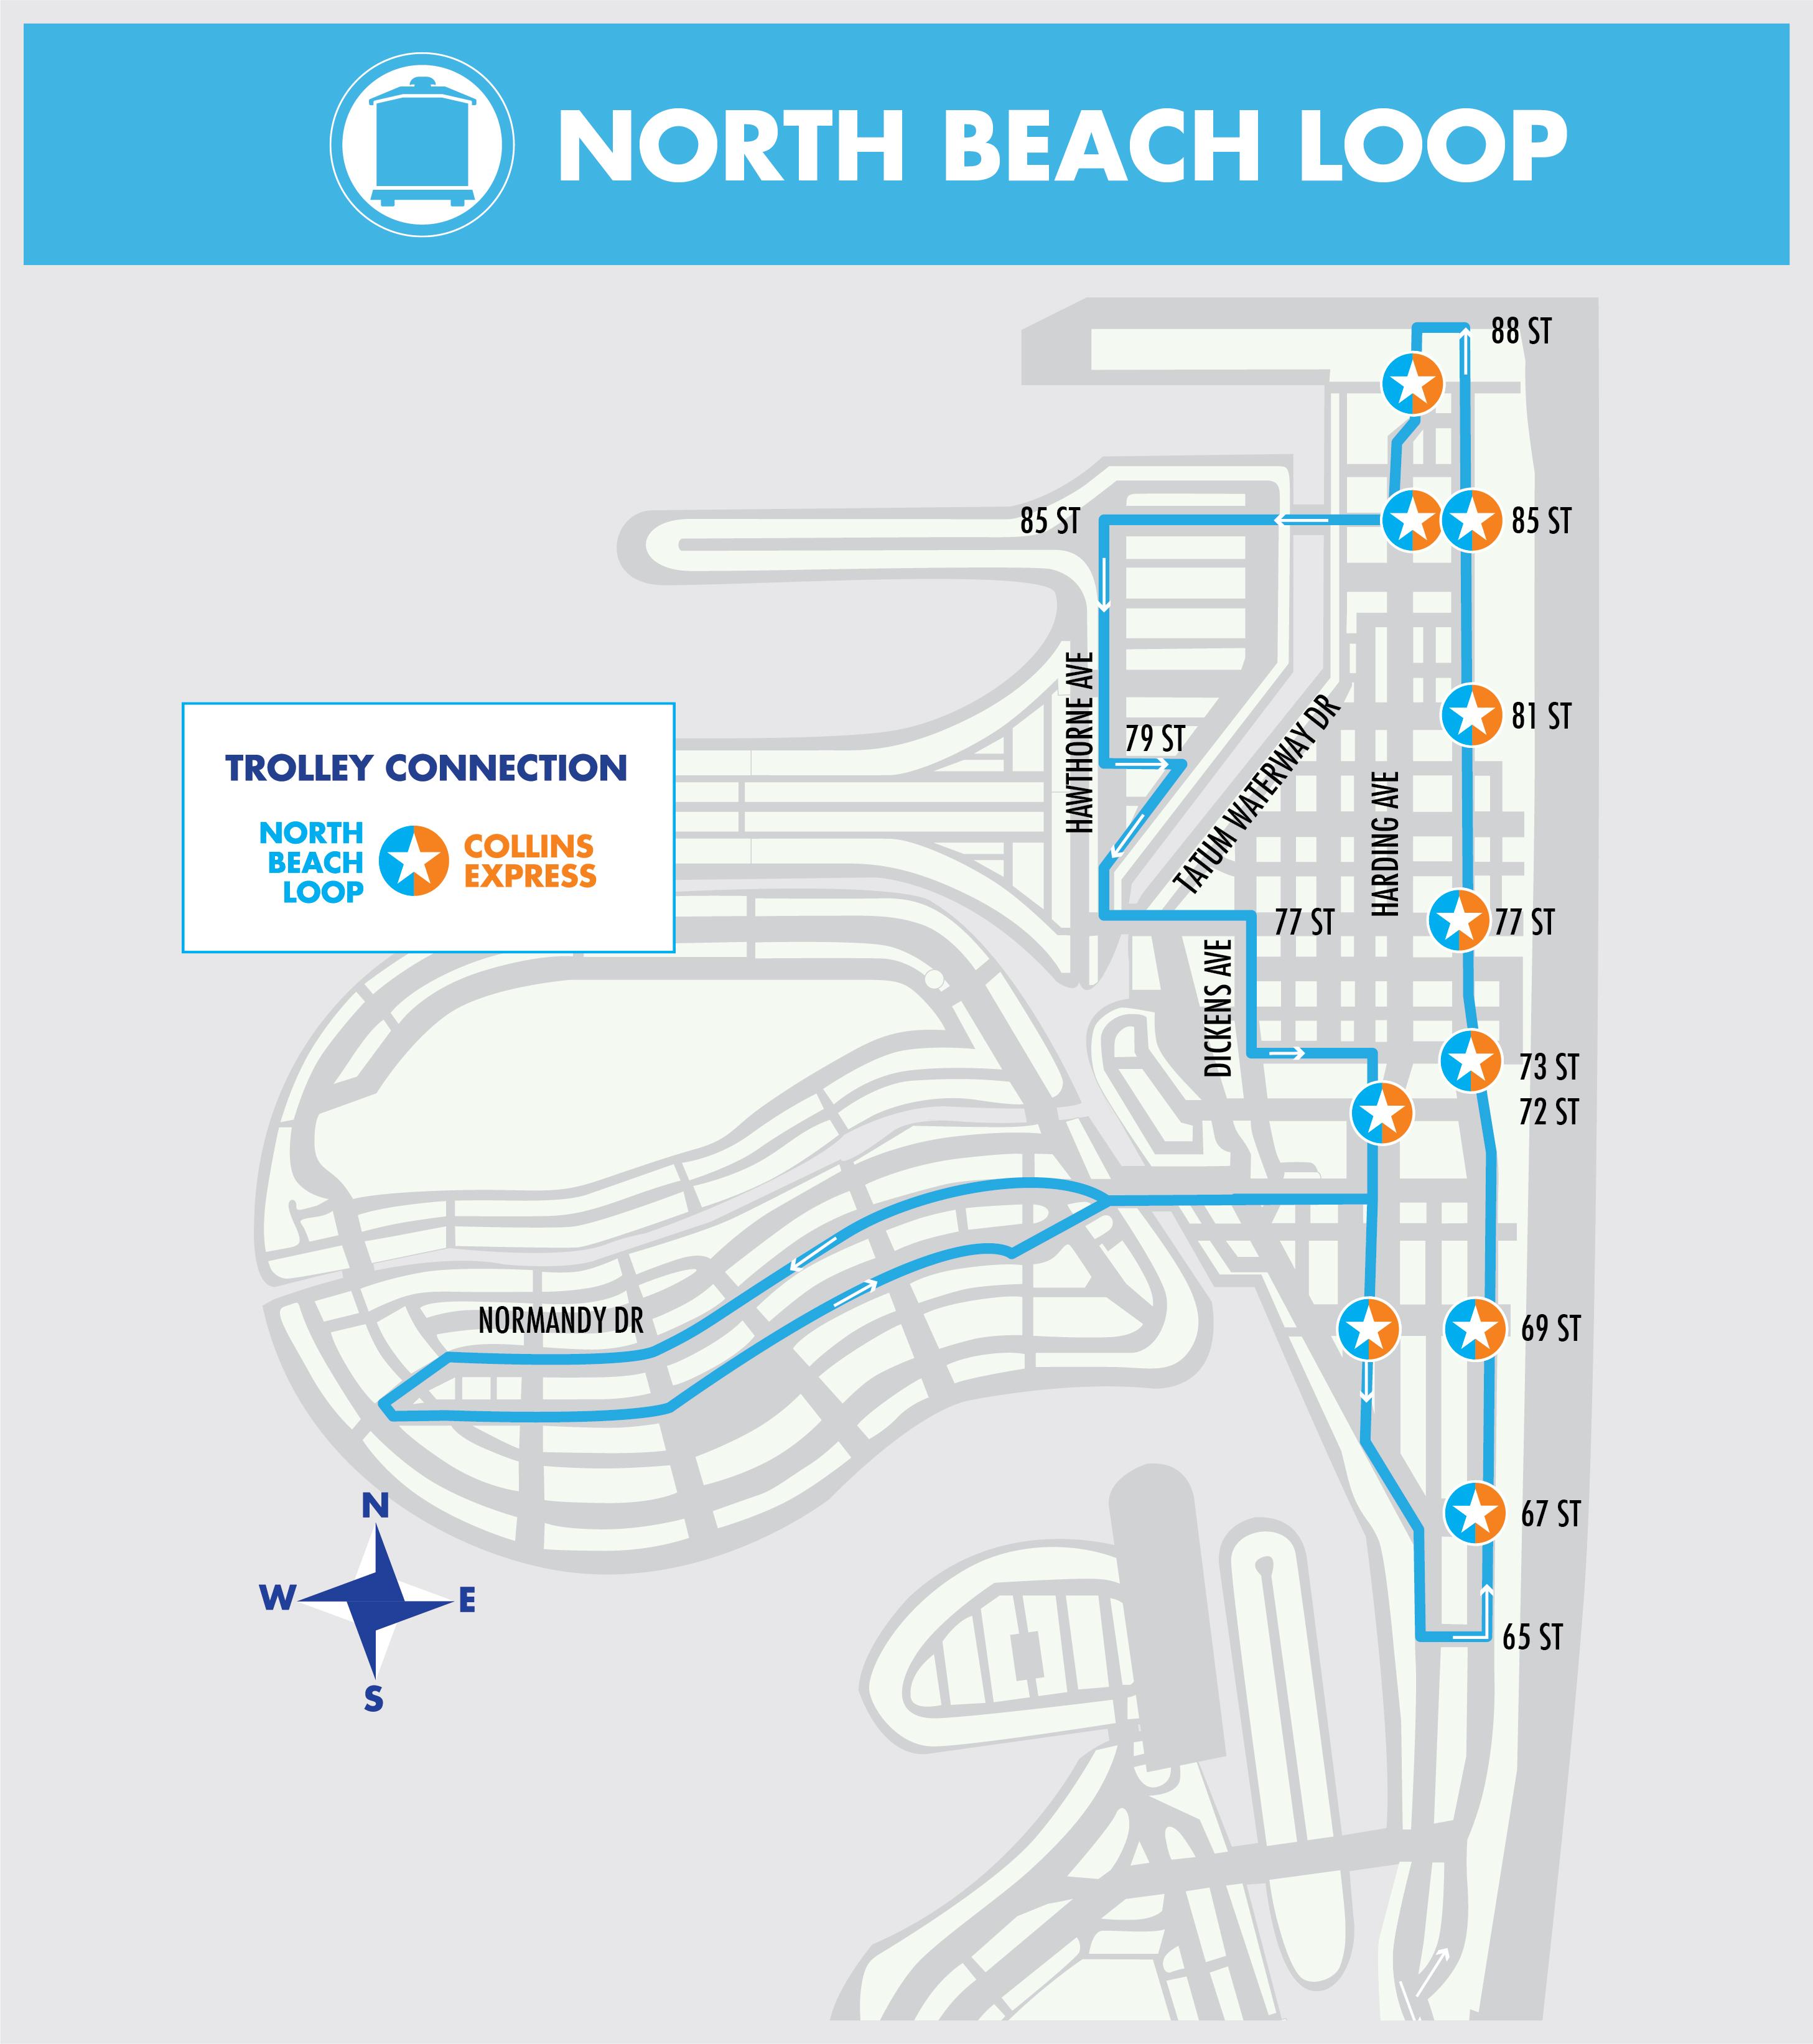 North Beach Loop Map